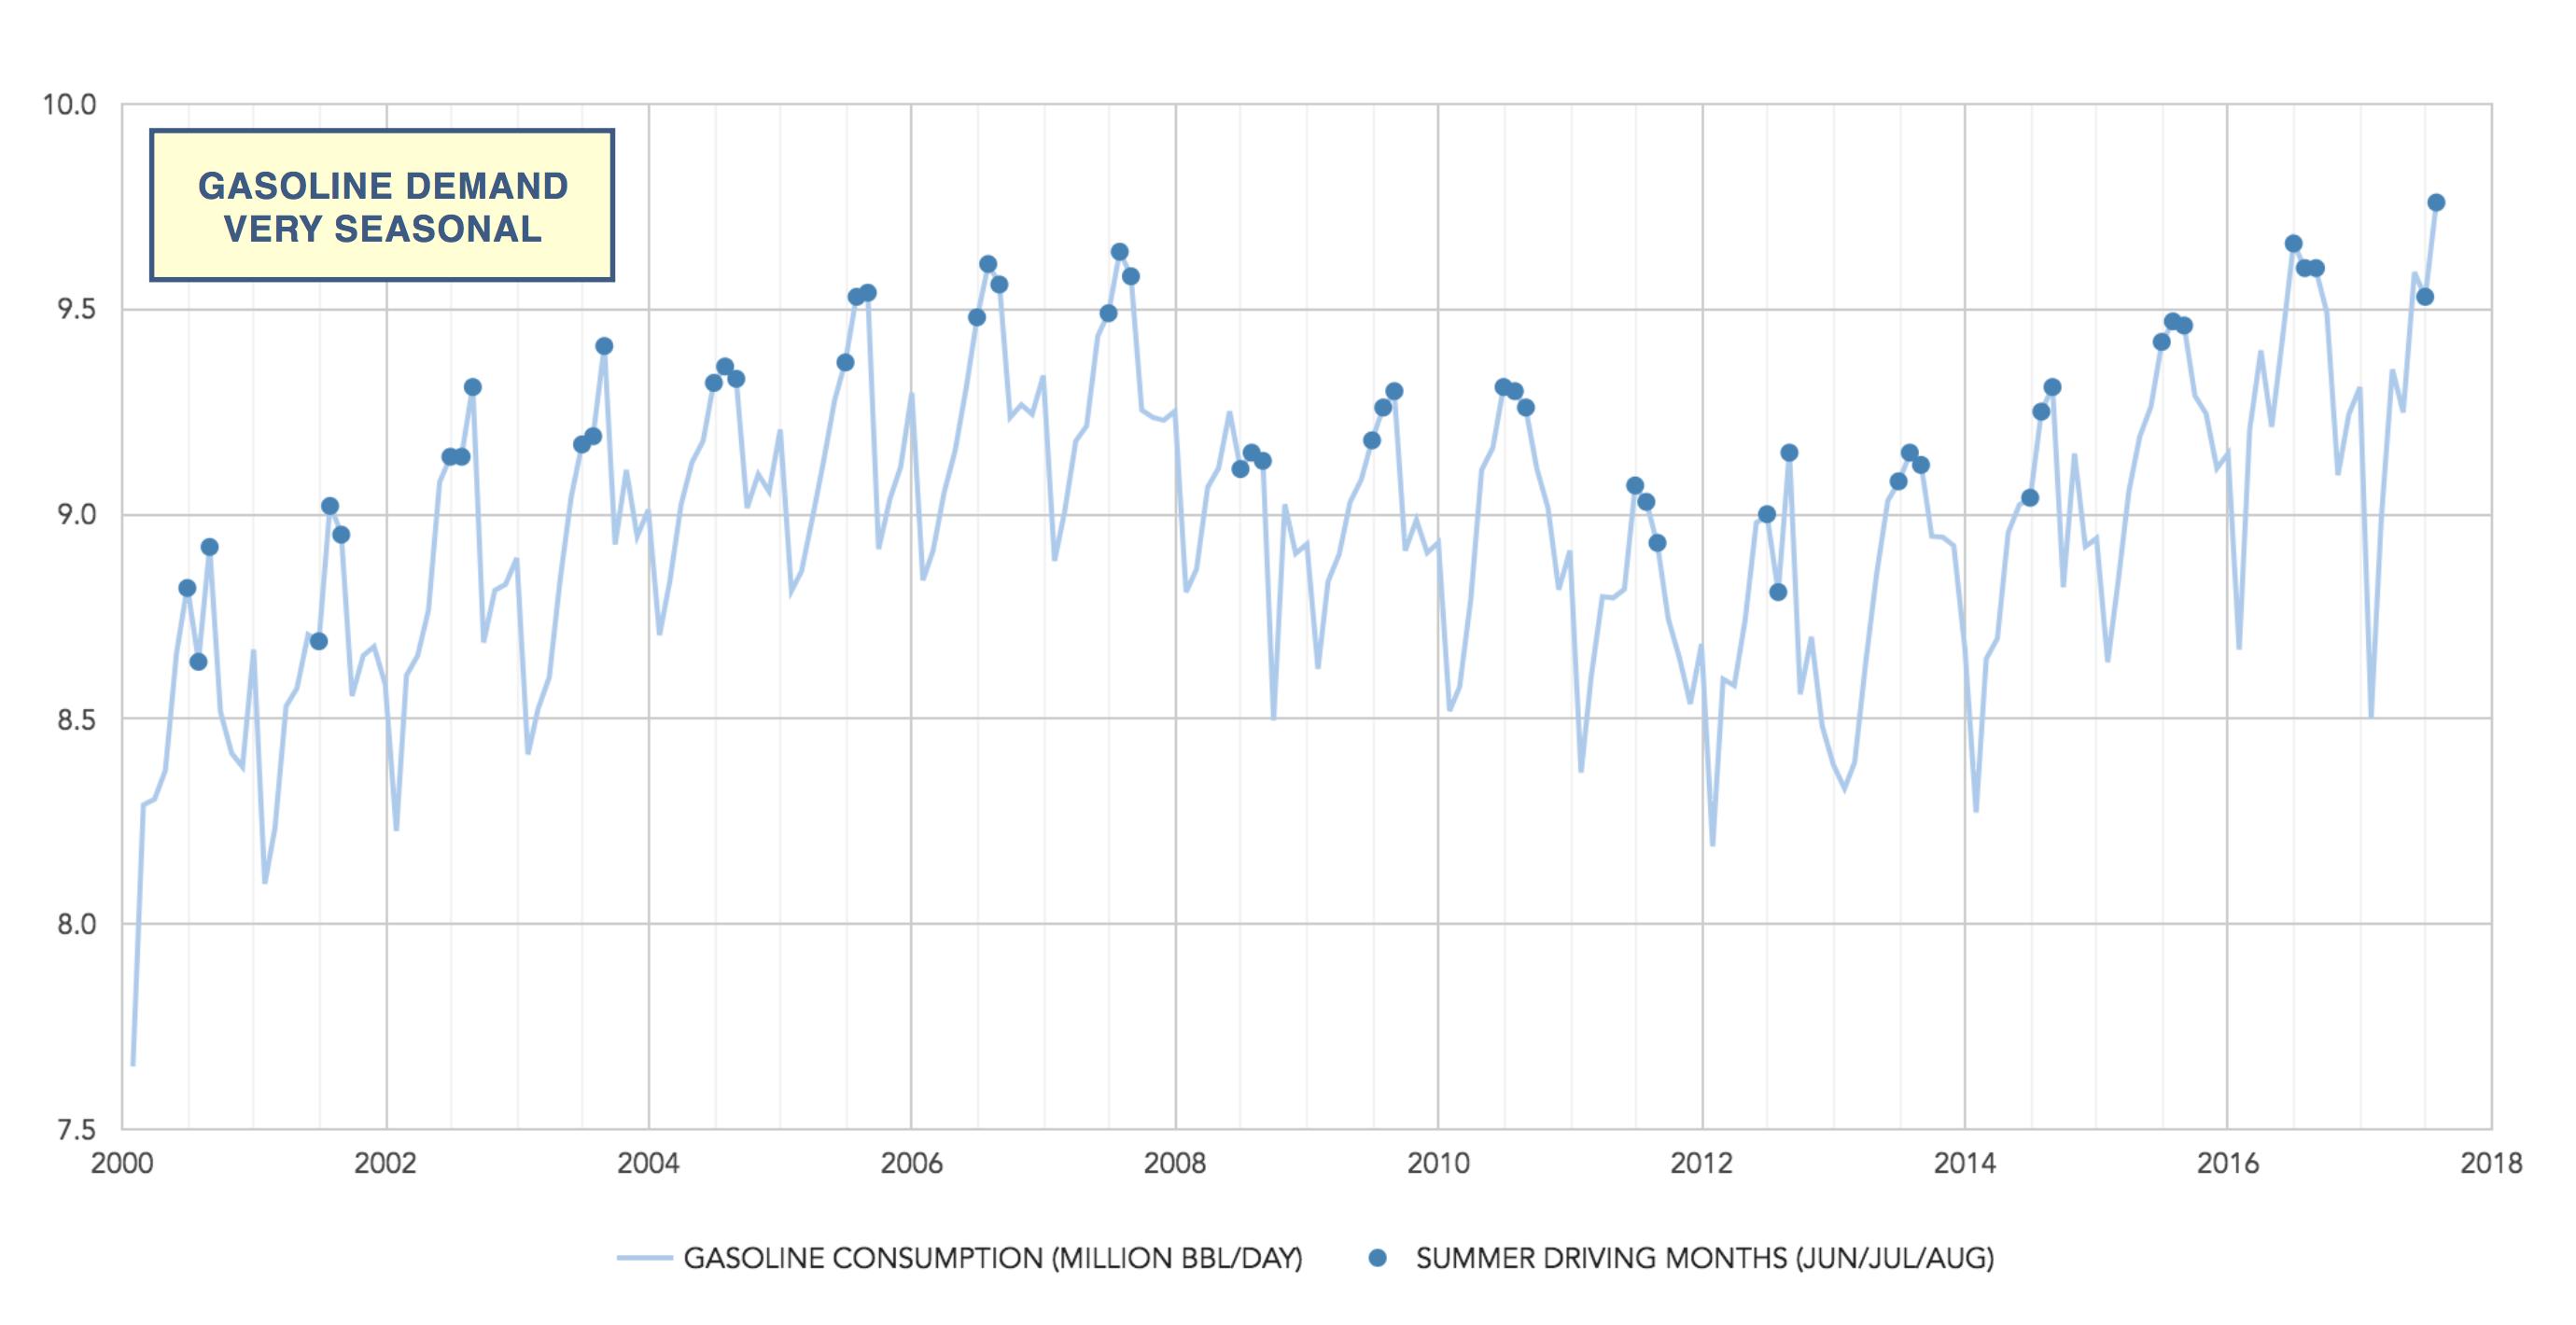 seasonality impacts on US gasoline demand